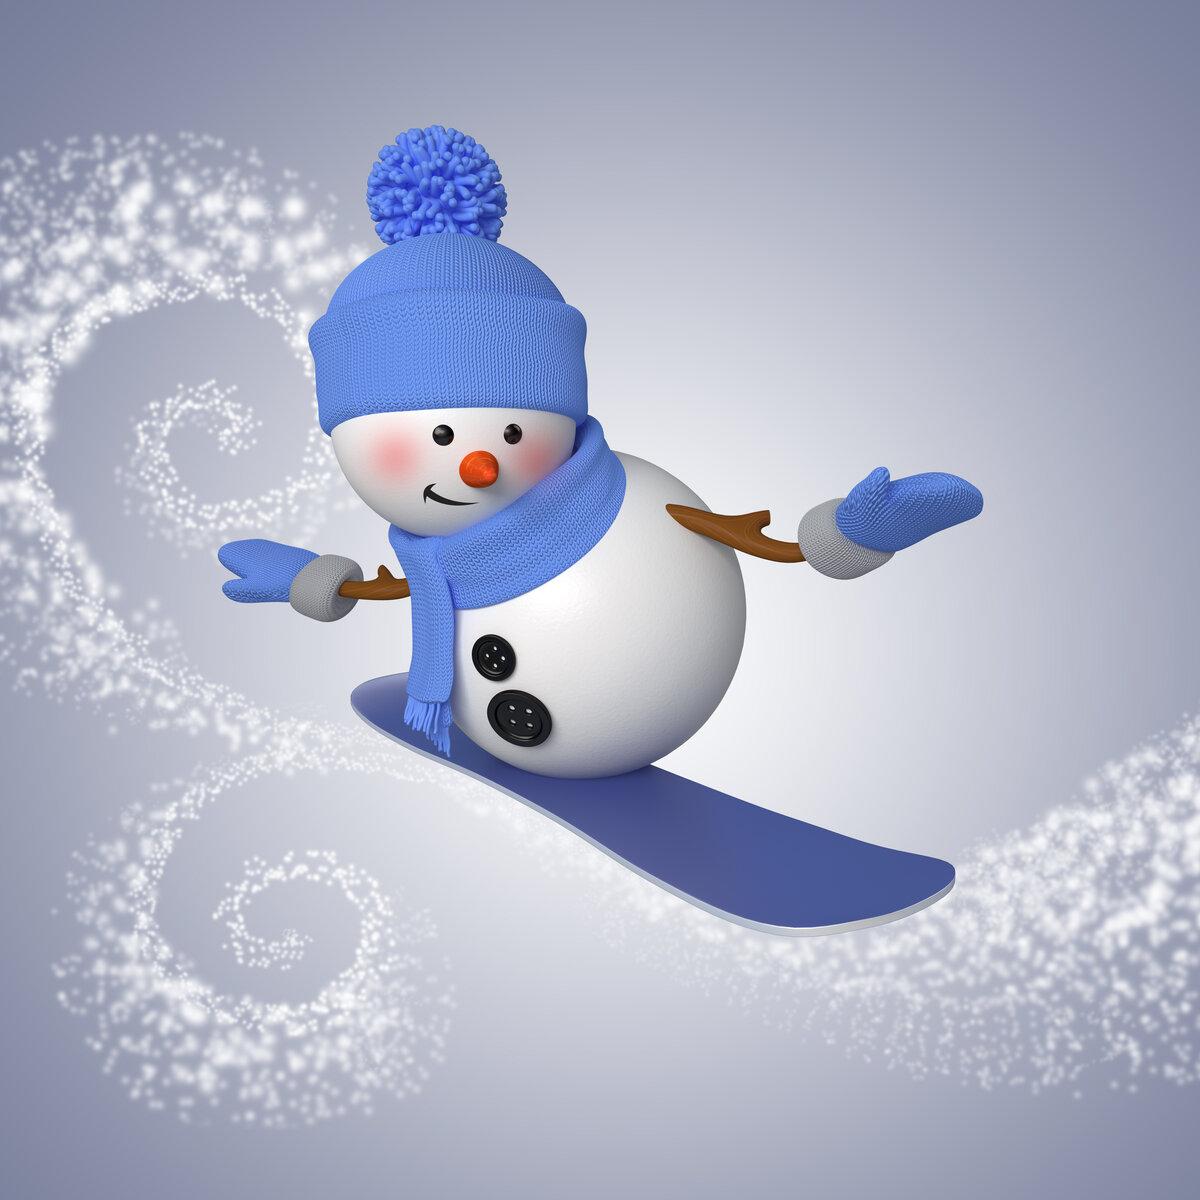 Картинка с снеговиком